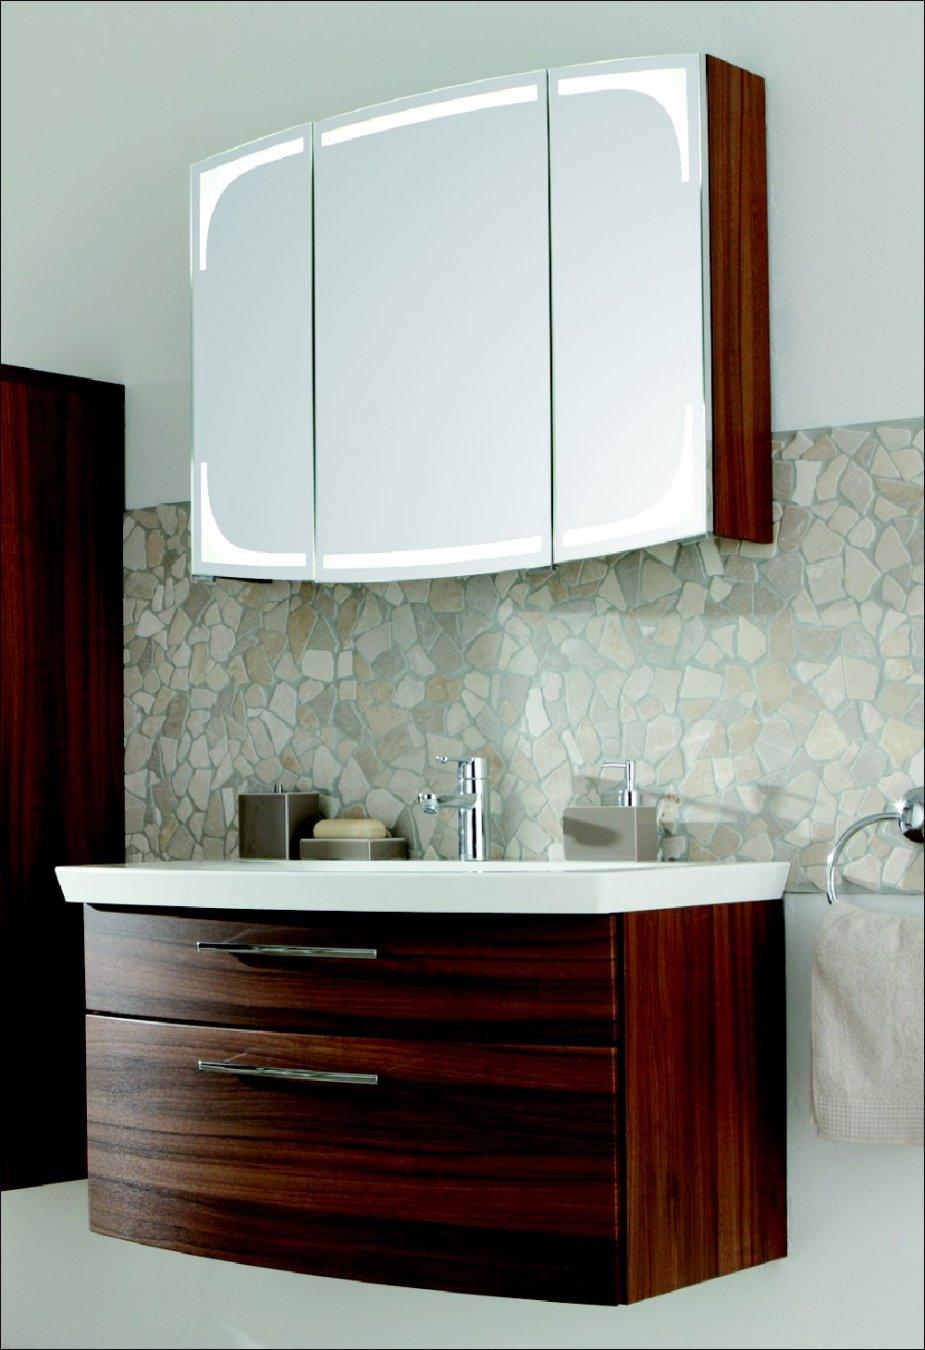 hochschrank classic line badschrank g nstig. Black Bedroom Furniture Sets. Home Design Ideas